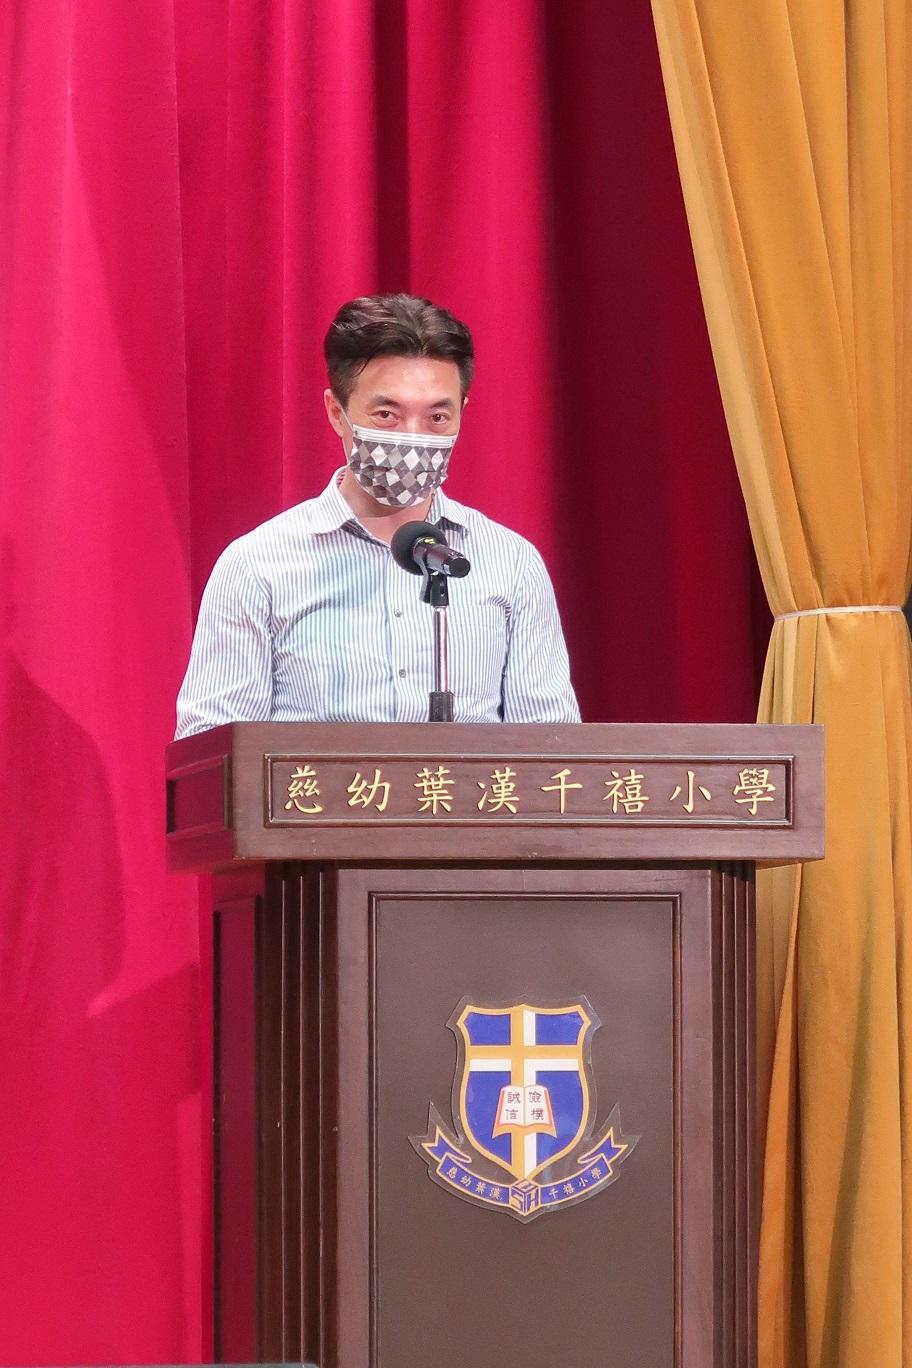 https://syh.edu.hk/sites/default/files/img_5357_1.jpg